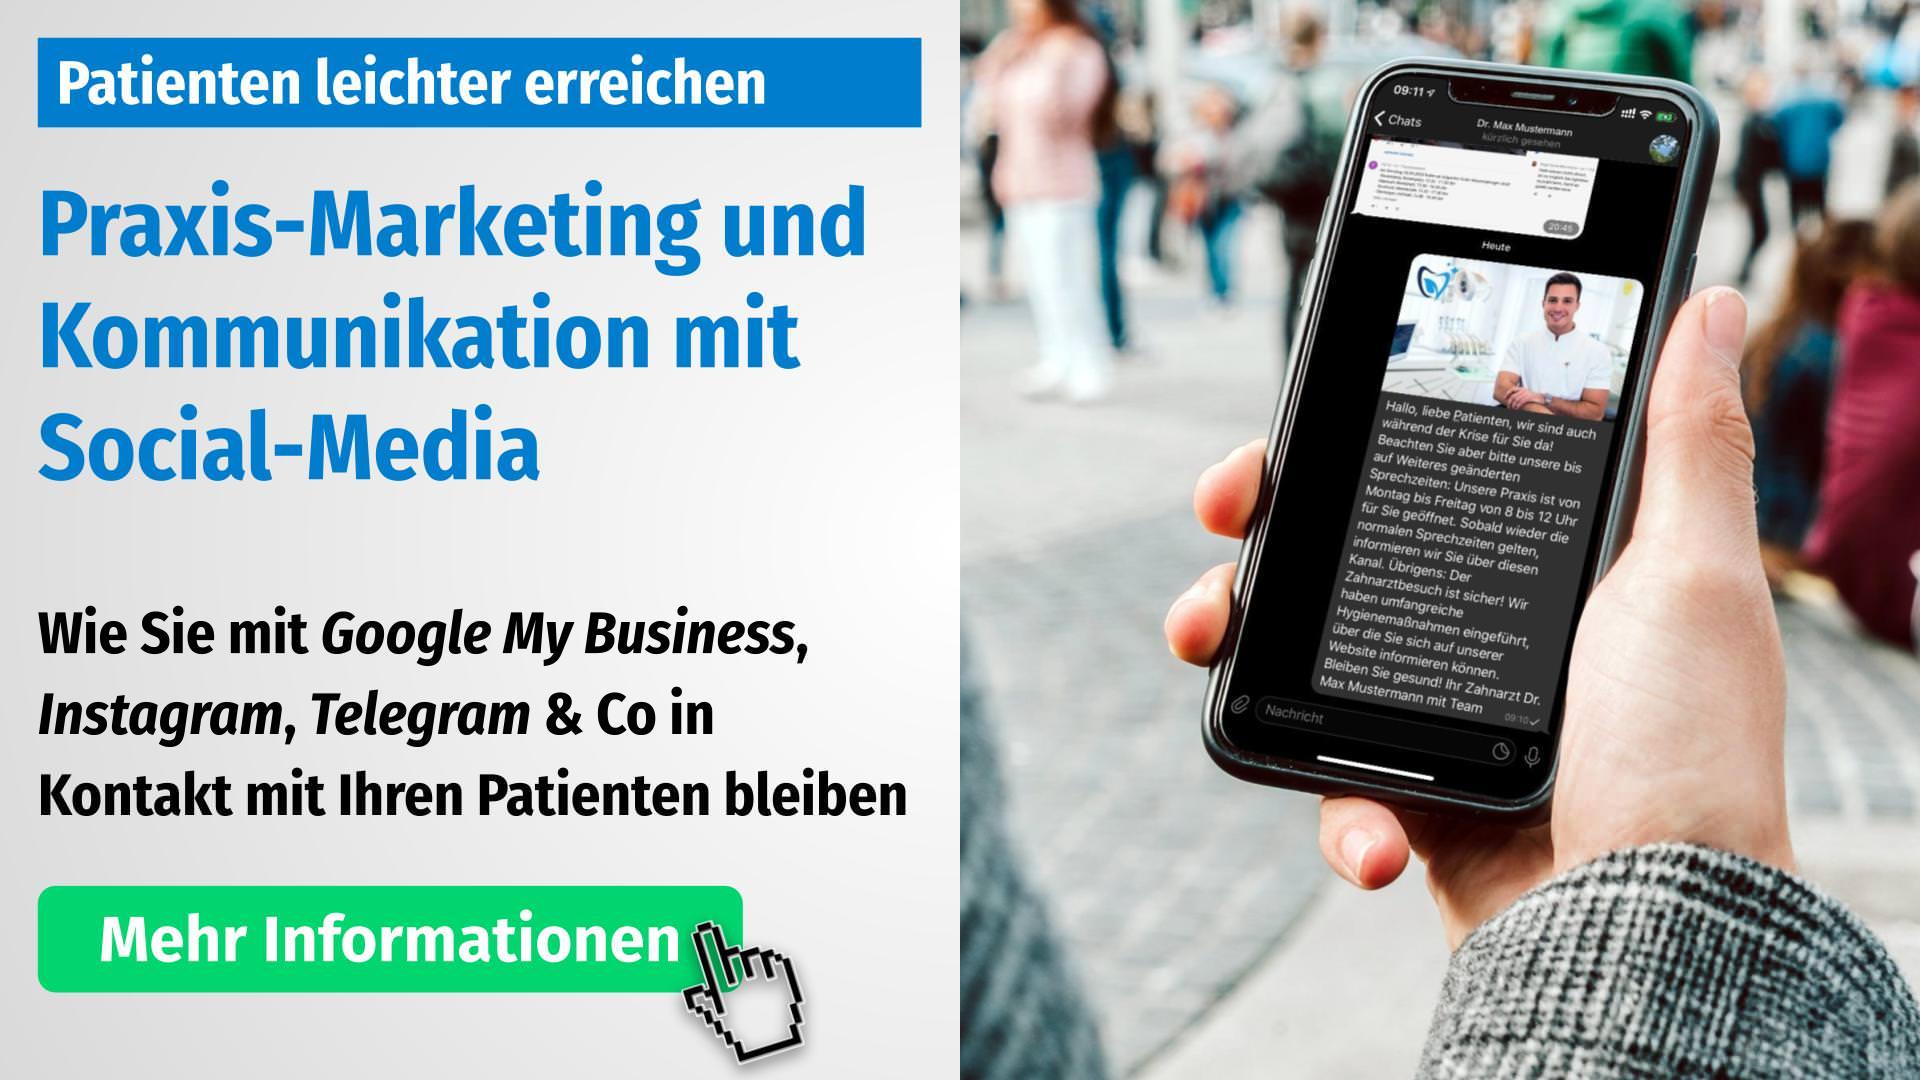 Praxis-Marketing mit Social-Media: Instagram, Facebook, Google My Business, Telegram WhatsApp